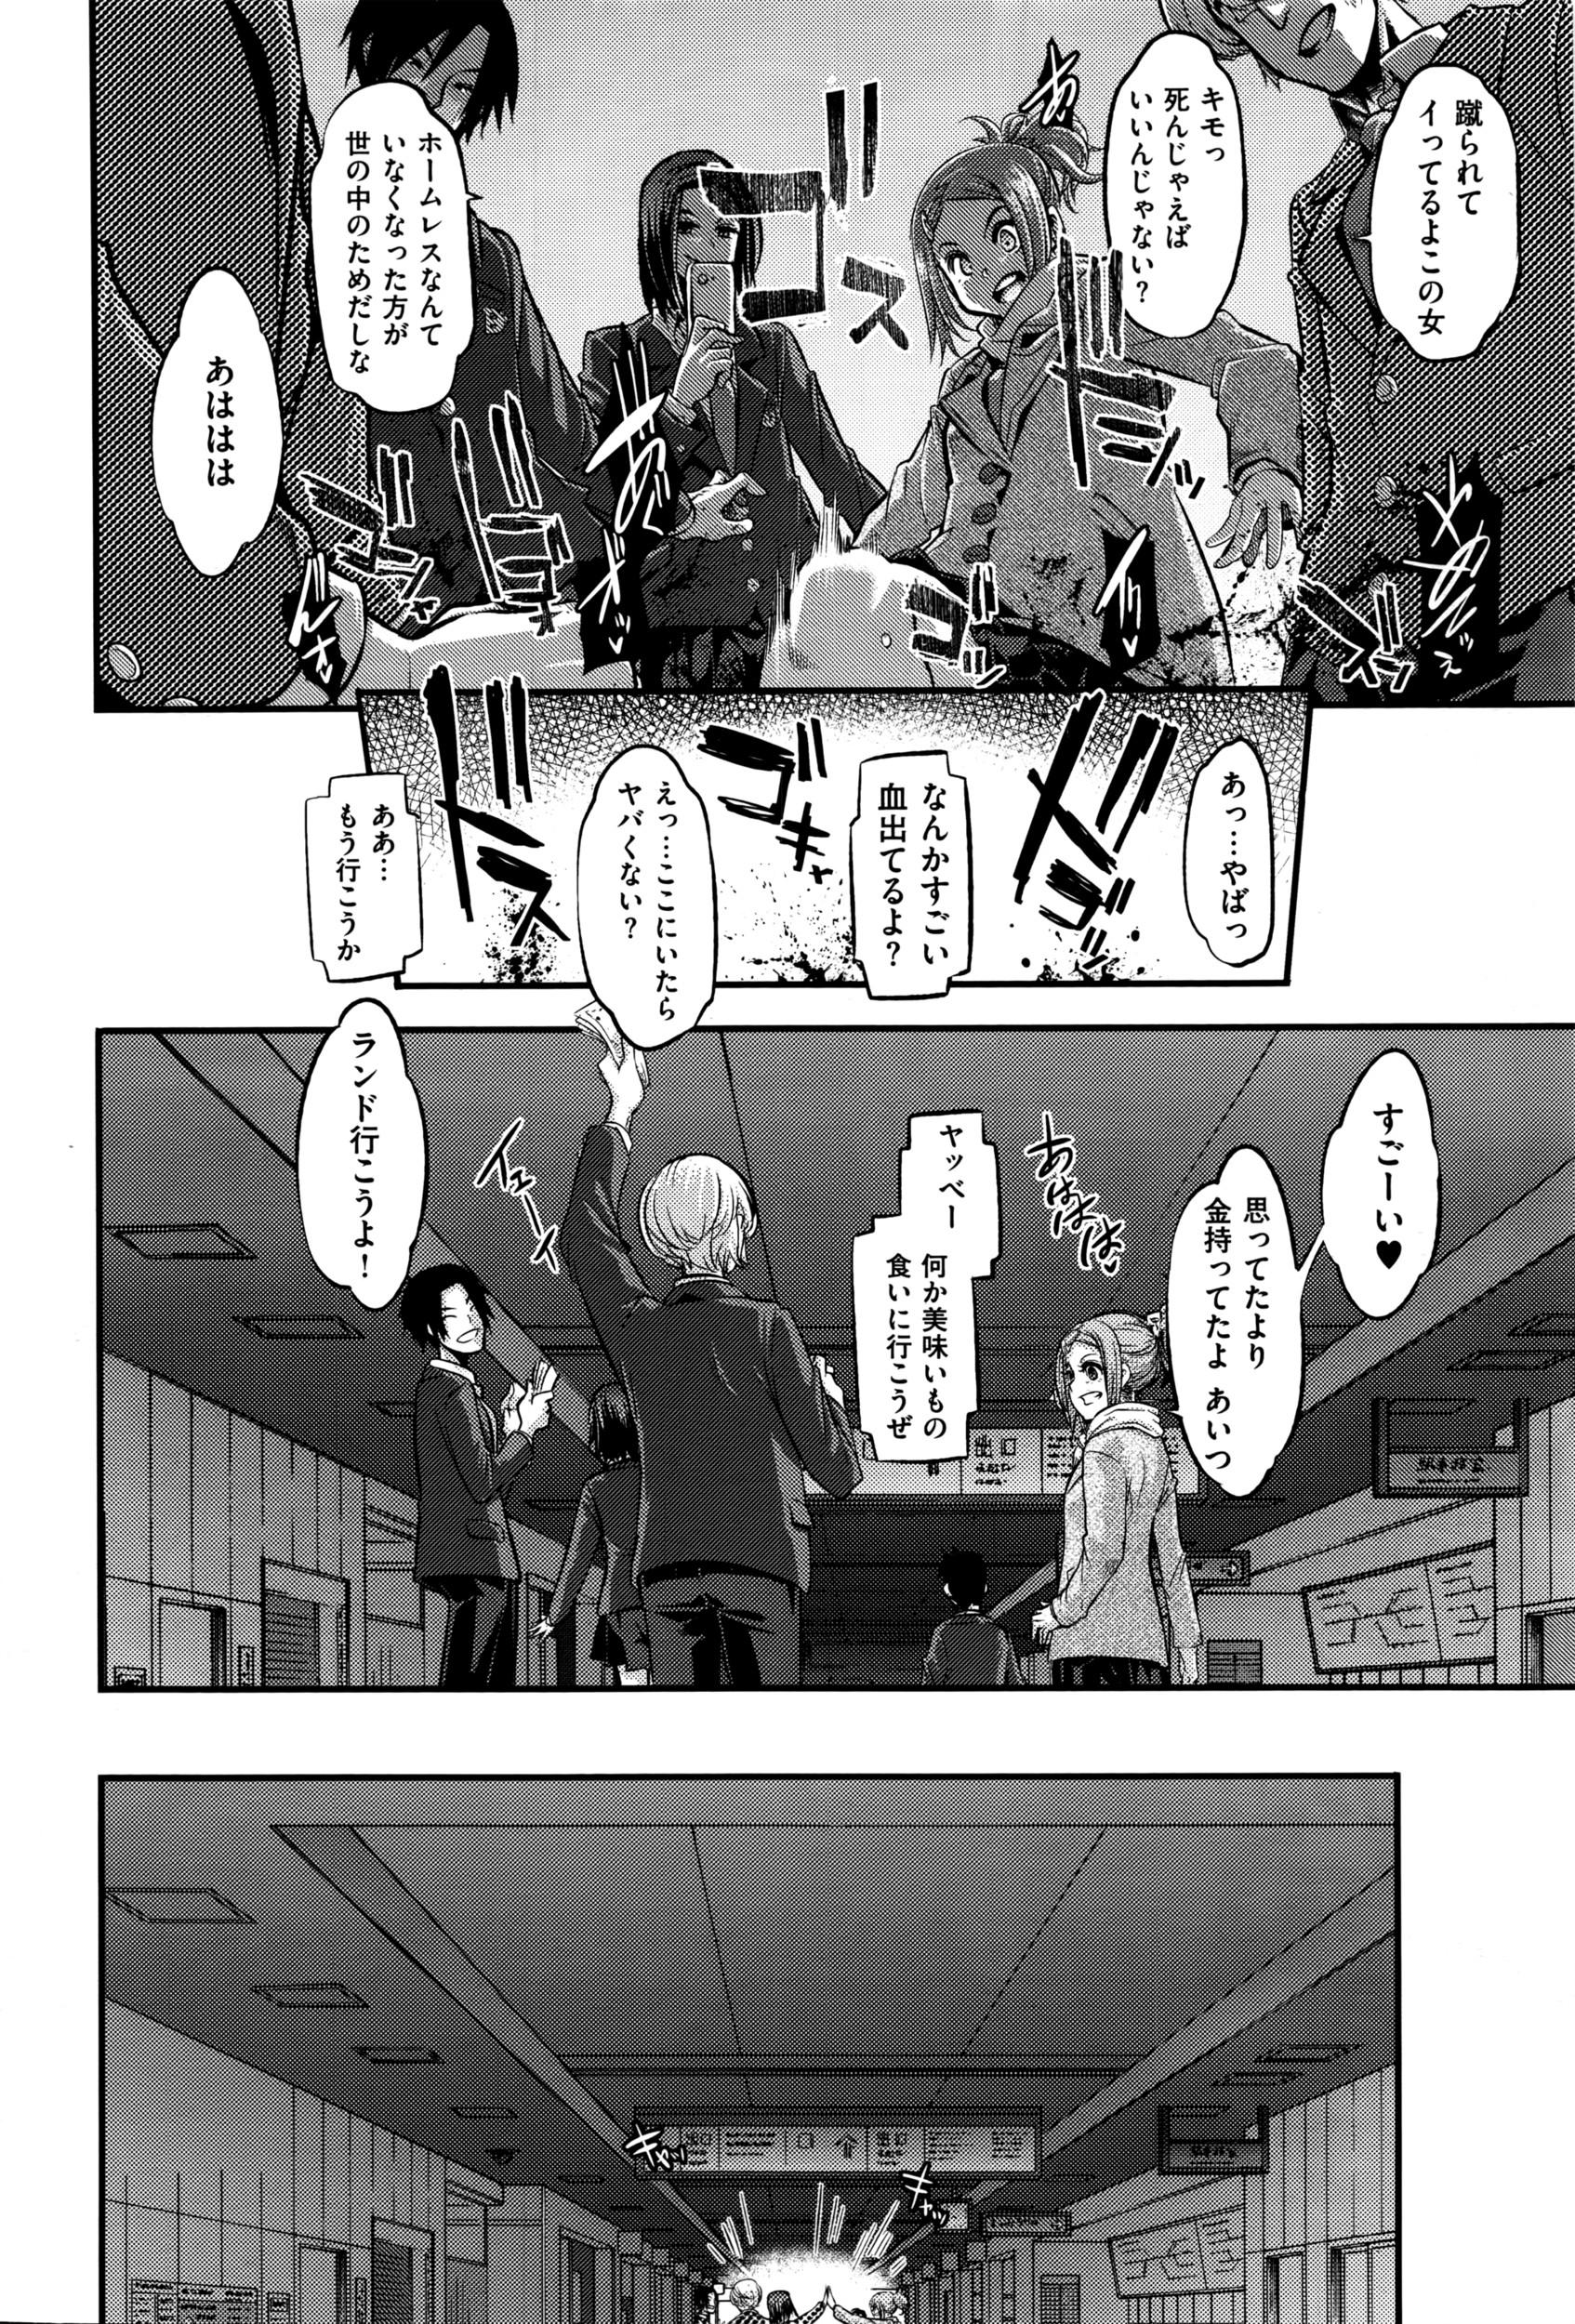 [ShindoL] Henshin -metamorphosis- Ch. 7 27